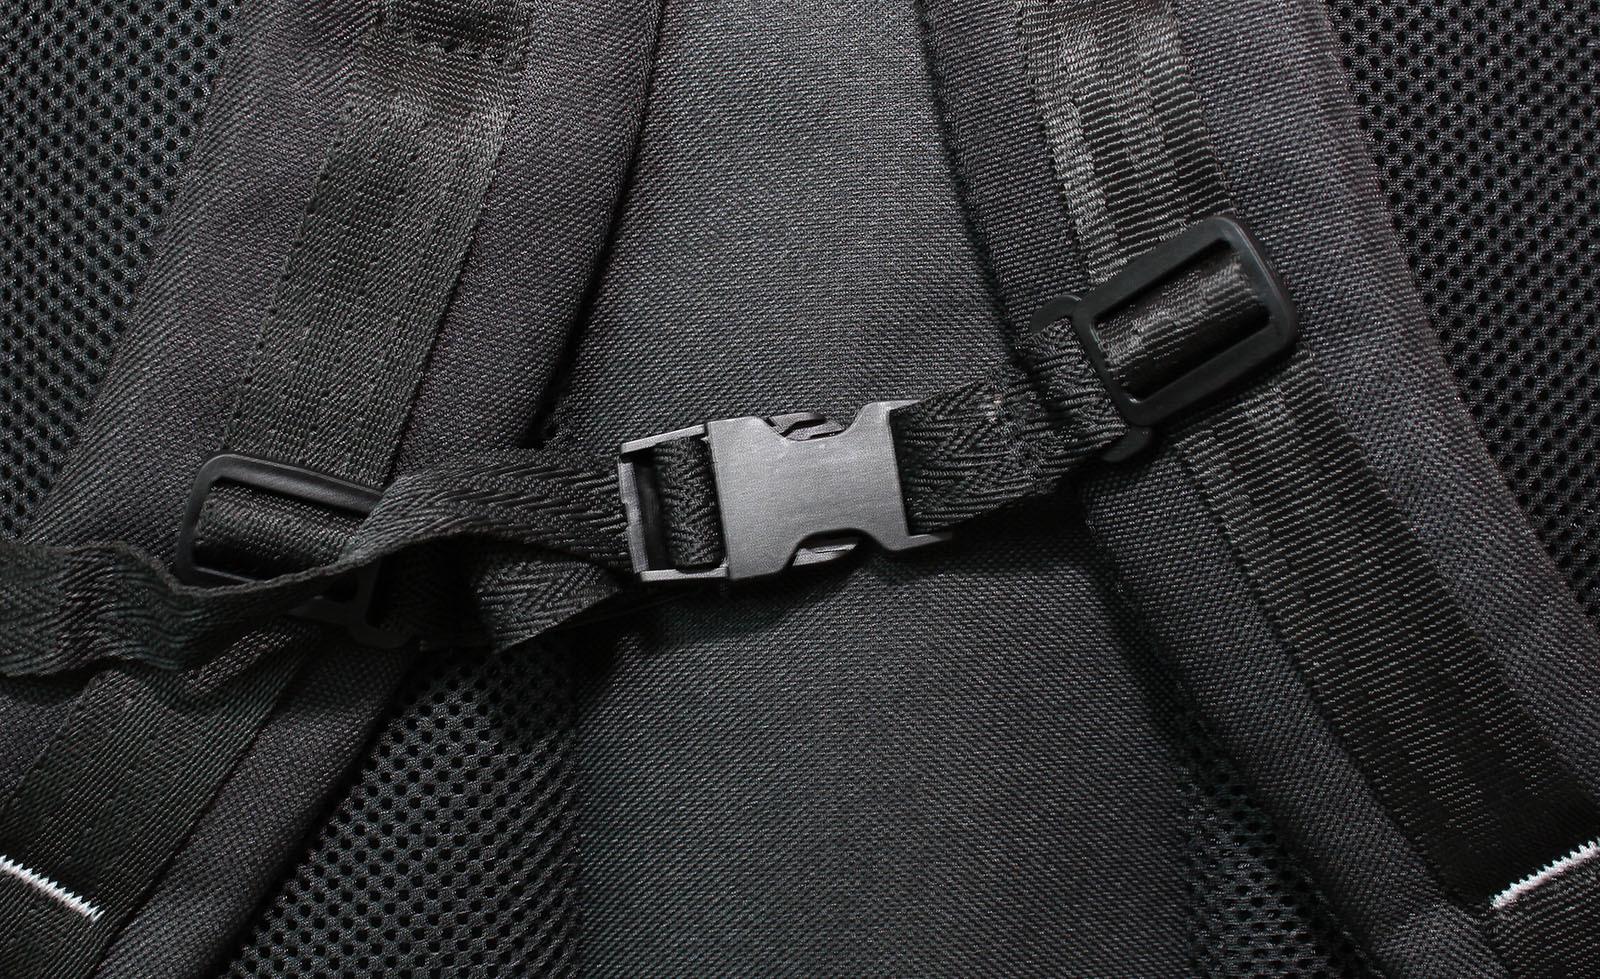 Рюкзак для ноутбука Bagland Рюкзак ZOOTY 24 л. Чёрный (00531662) фото 5